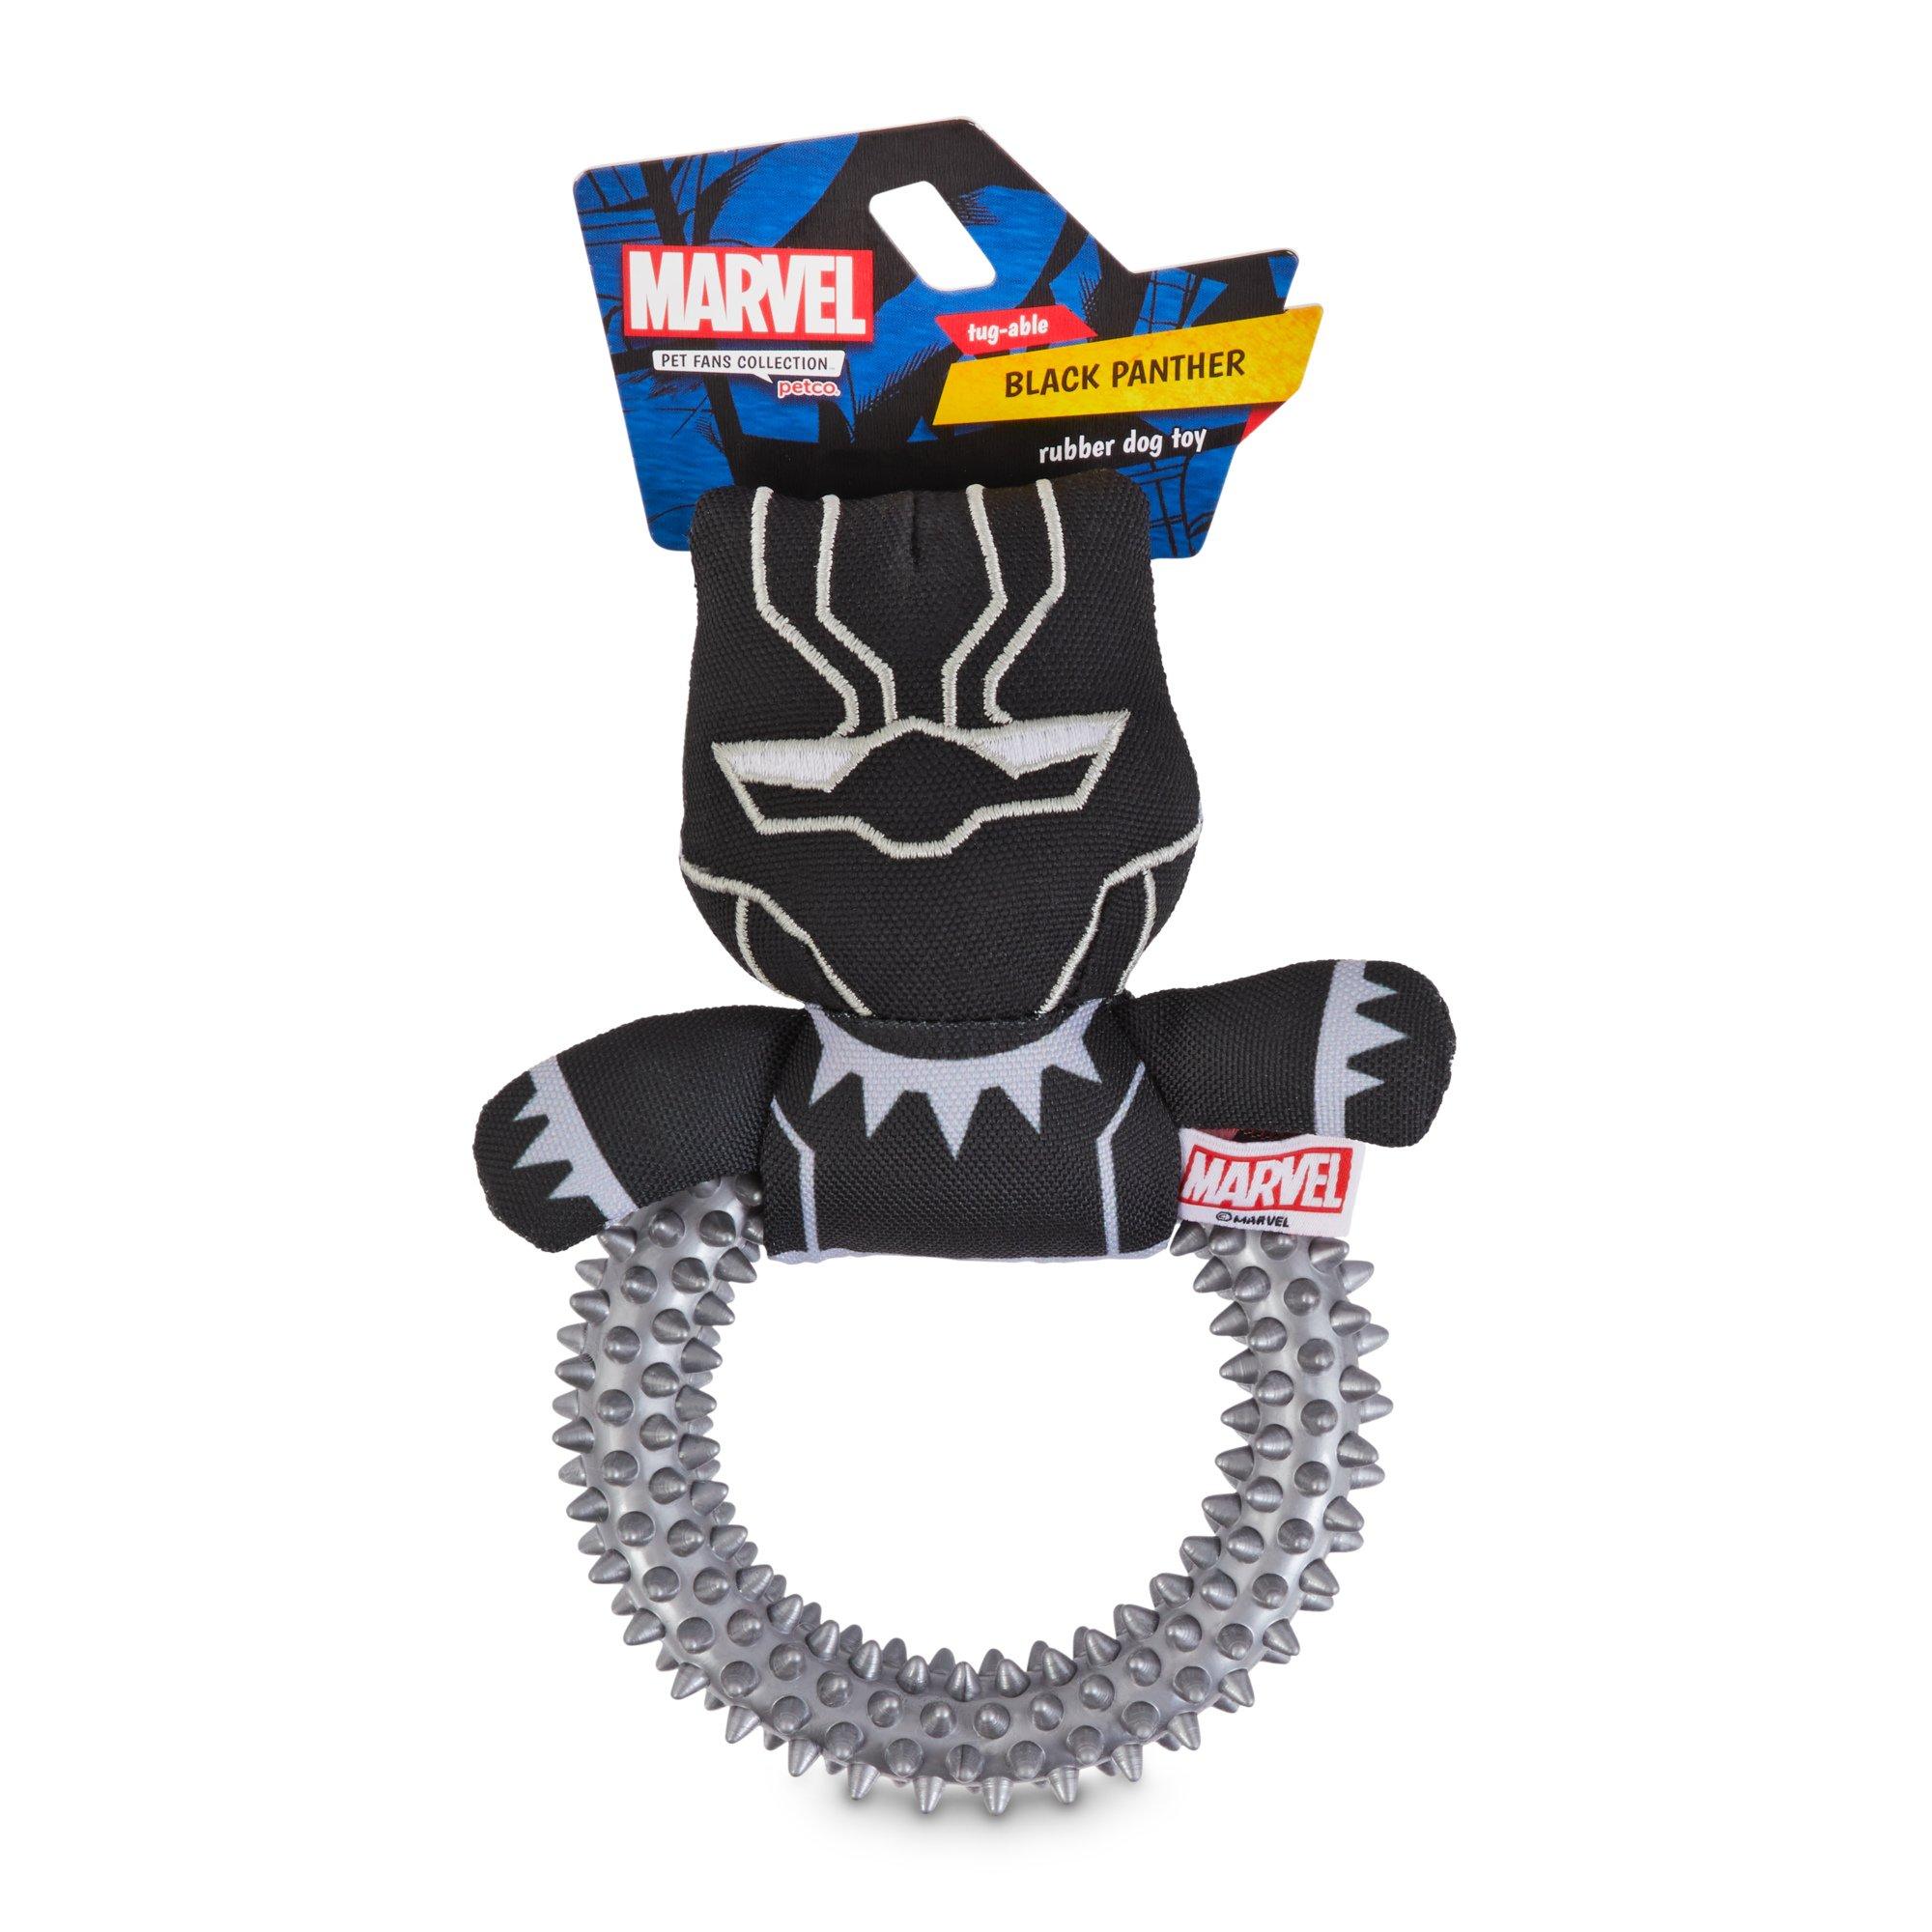 Marvel Avengers Black Panther Rubber Dog Toy Small In 2020 Dog Toys Black Panther Black Panther Character